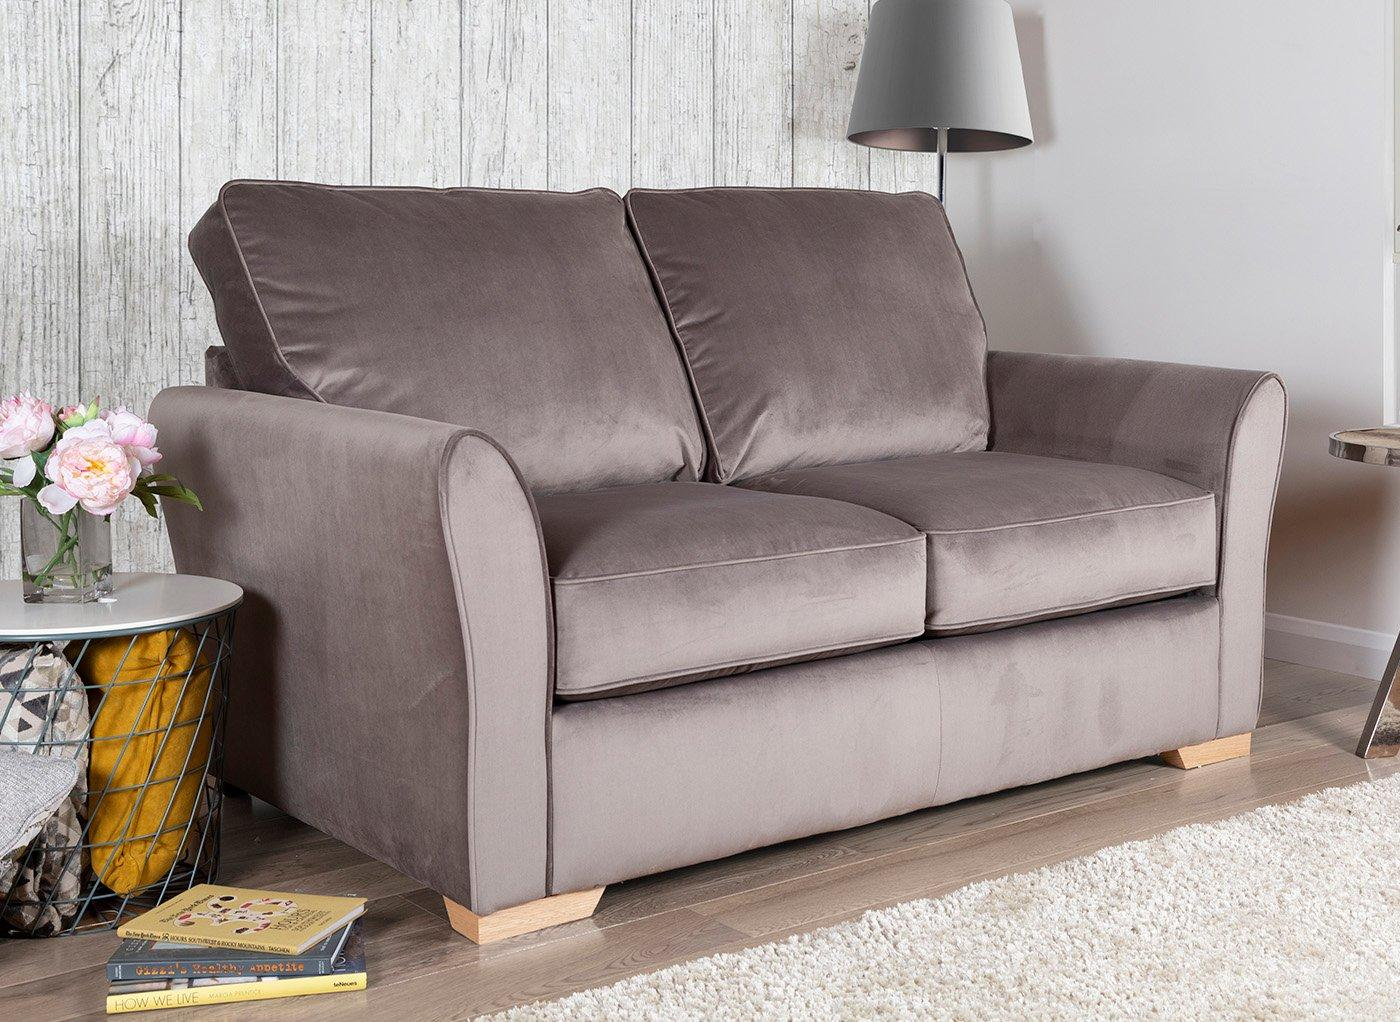 willis-fold-out-premium-sofa-bed